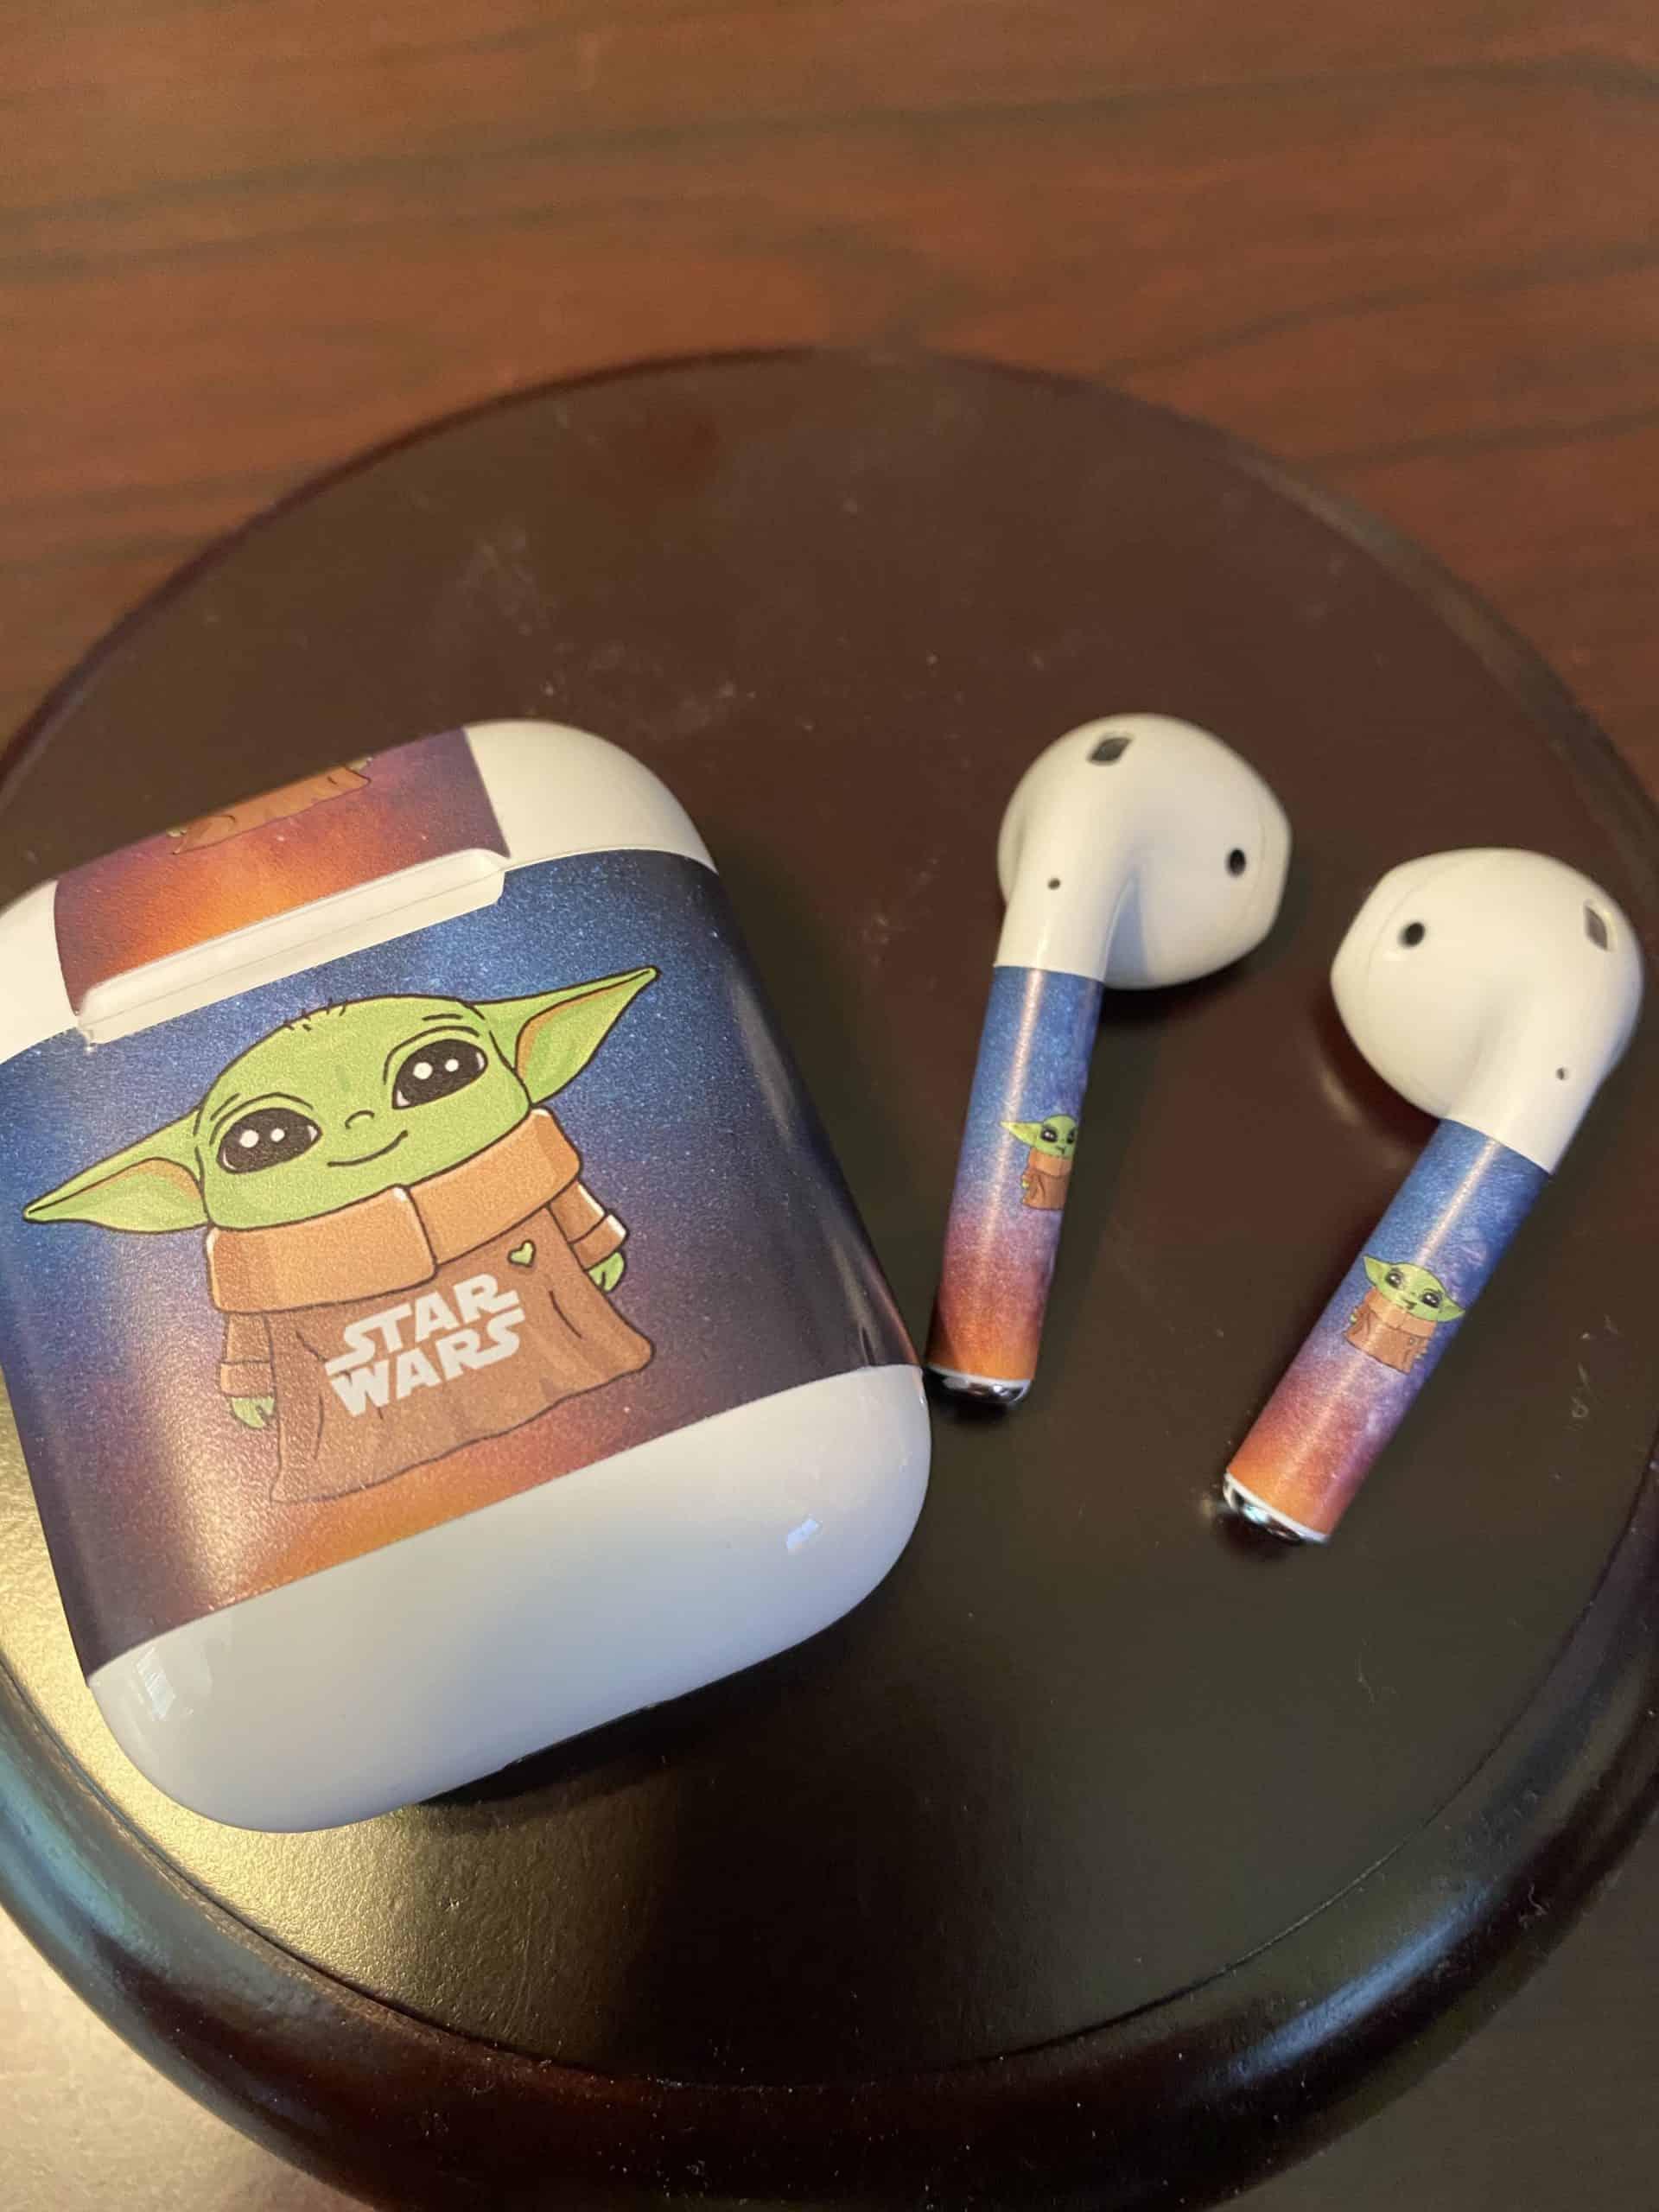 4 Piece Baby Yoda Airpod Case Wrap Vmc Communications